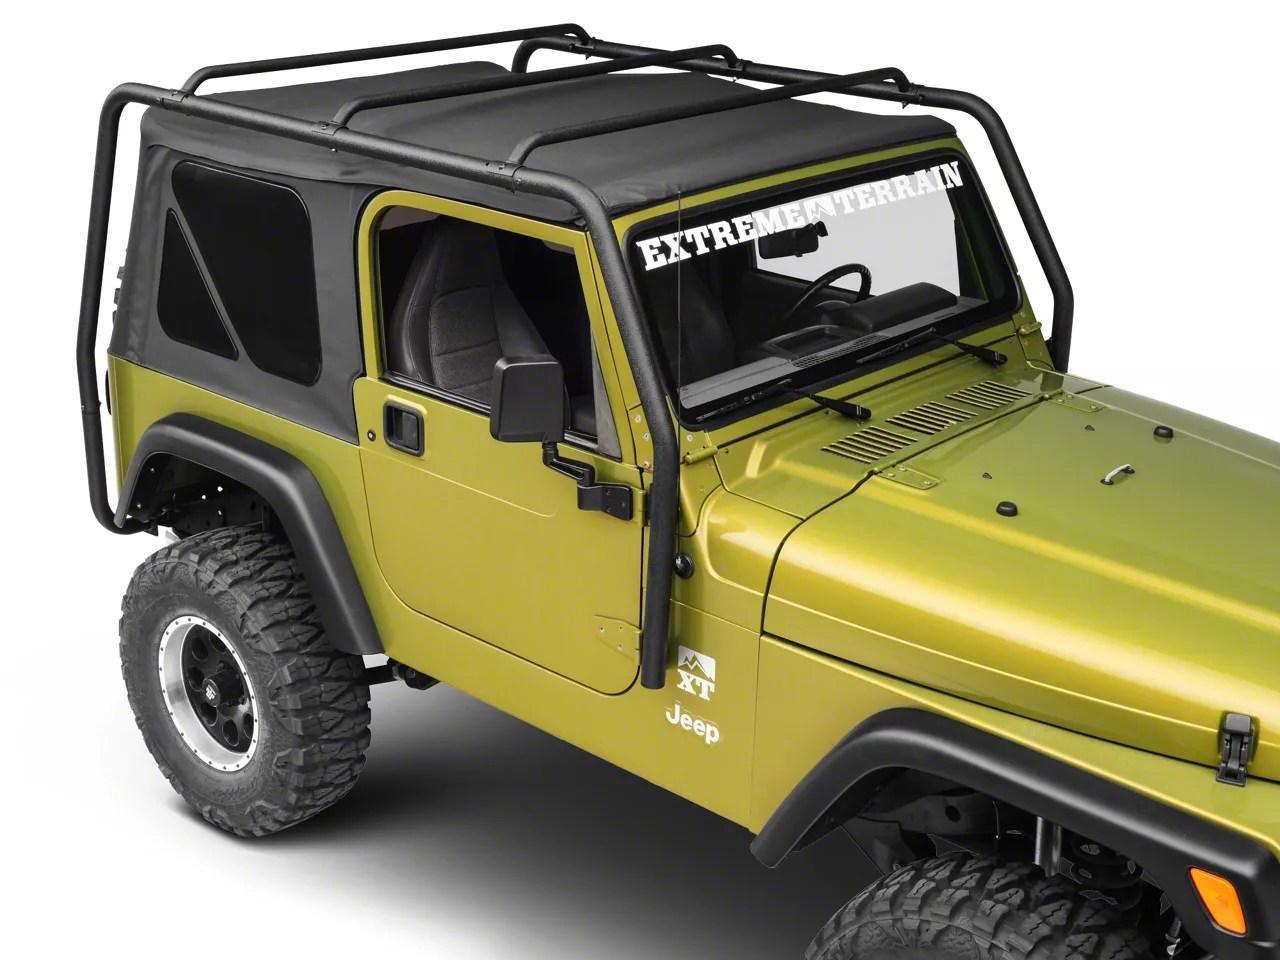 smittybilt src roof rack textured black 97 06 jeep wrangler tj excluding unlimited